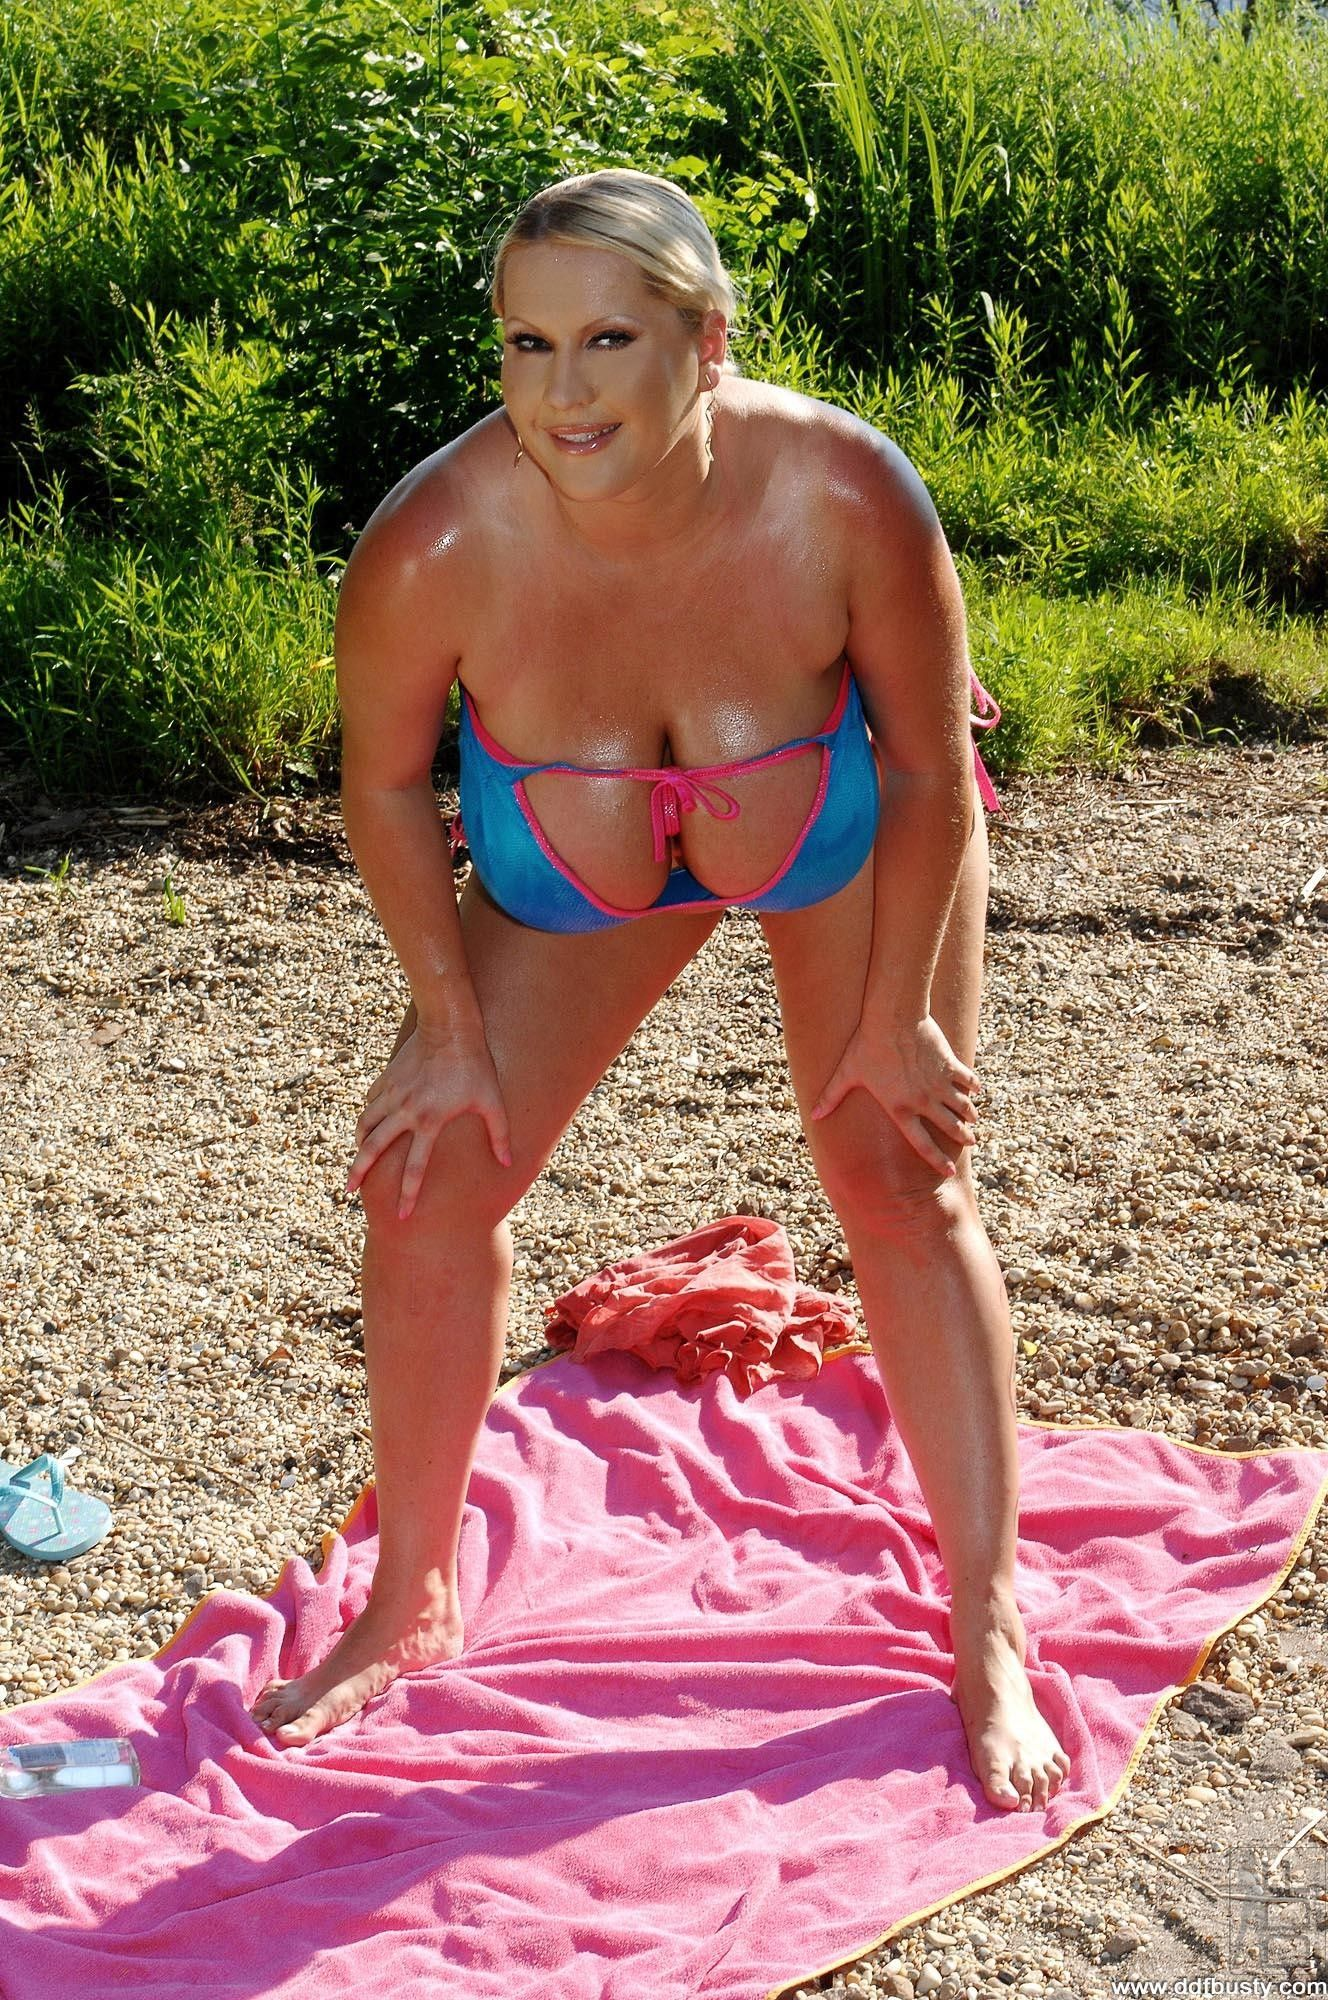 Laura orsolya bikini